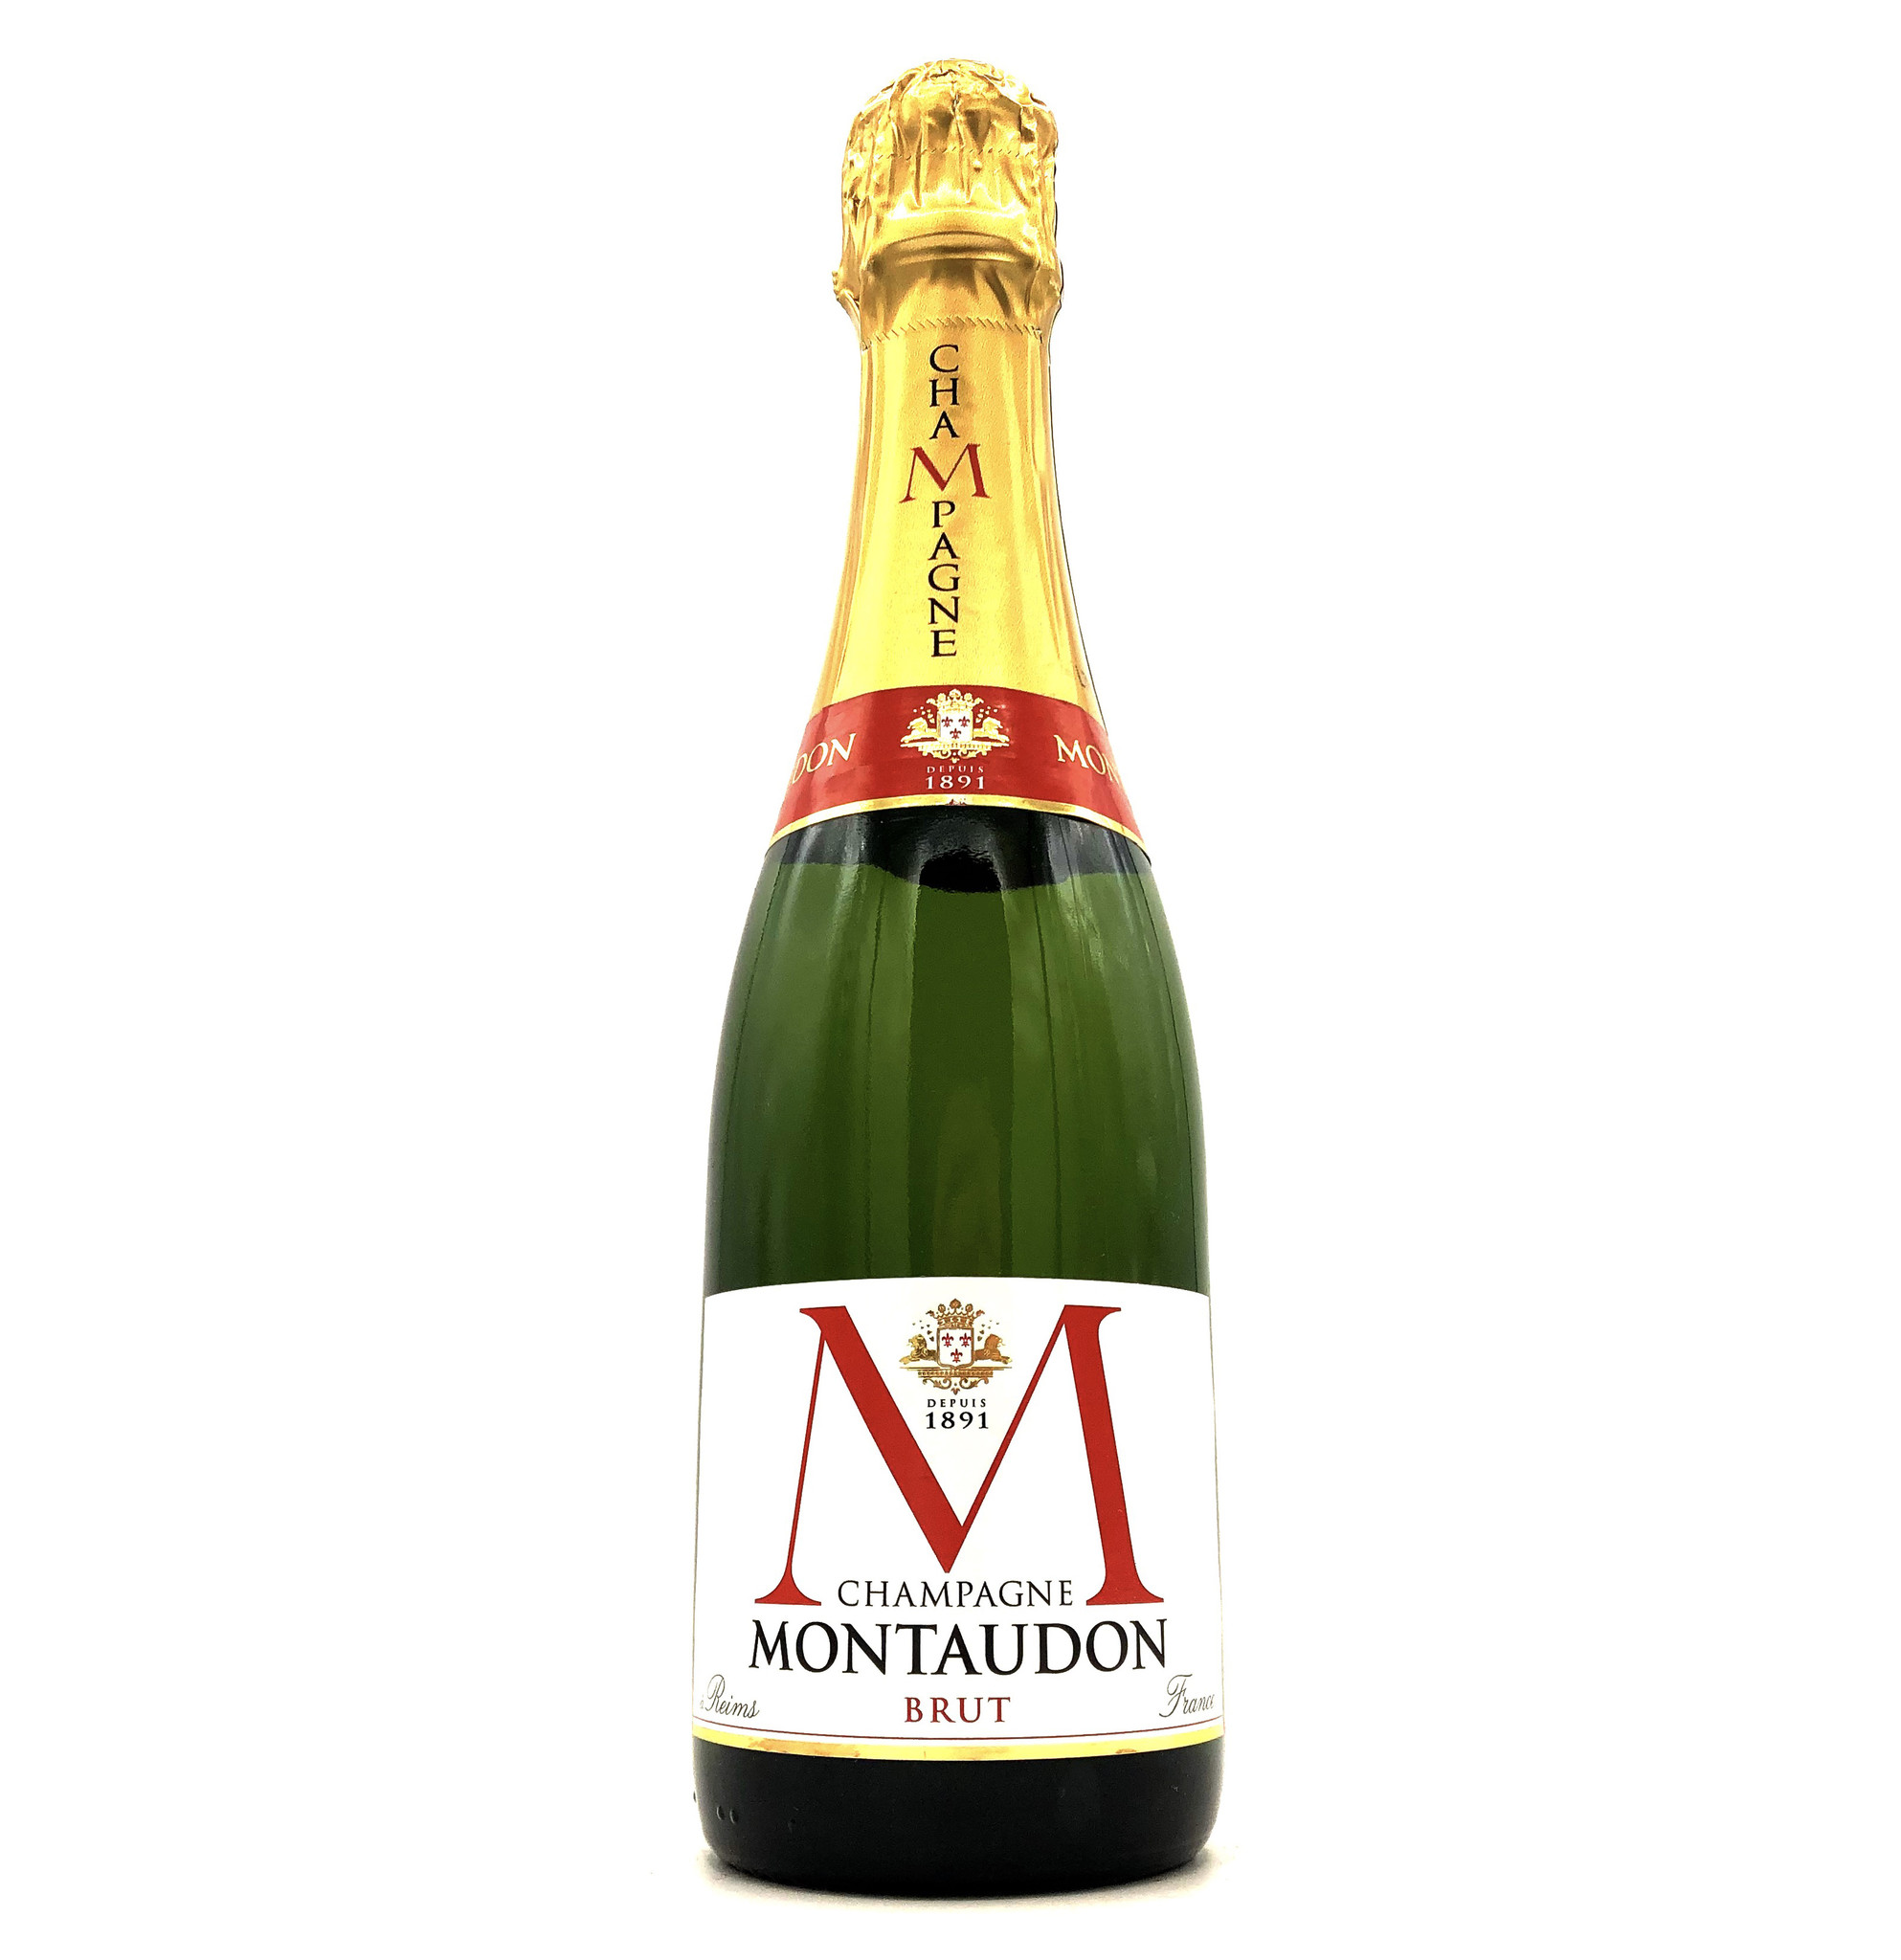 Champagne Brut 375mL NV Montaudon